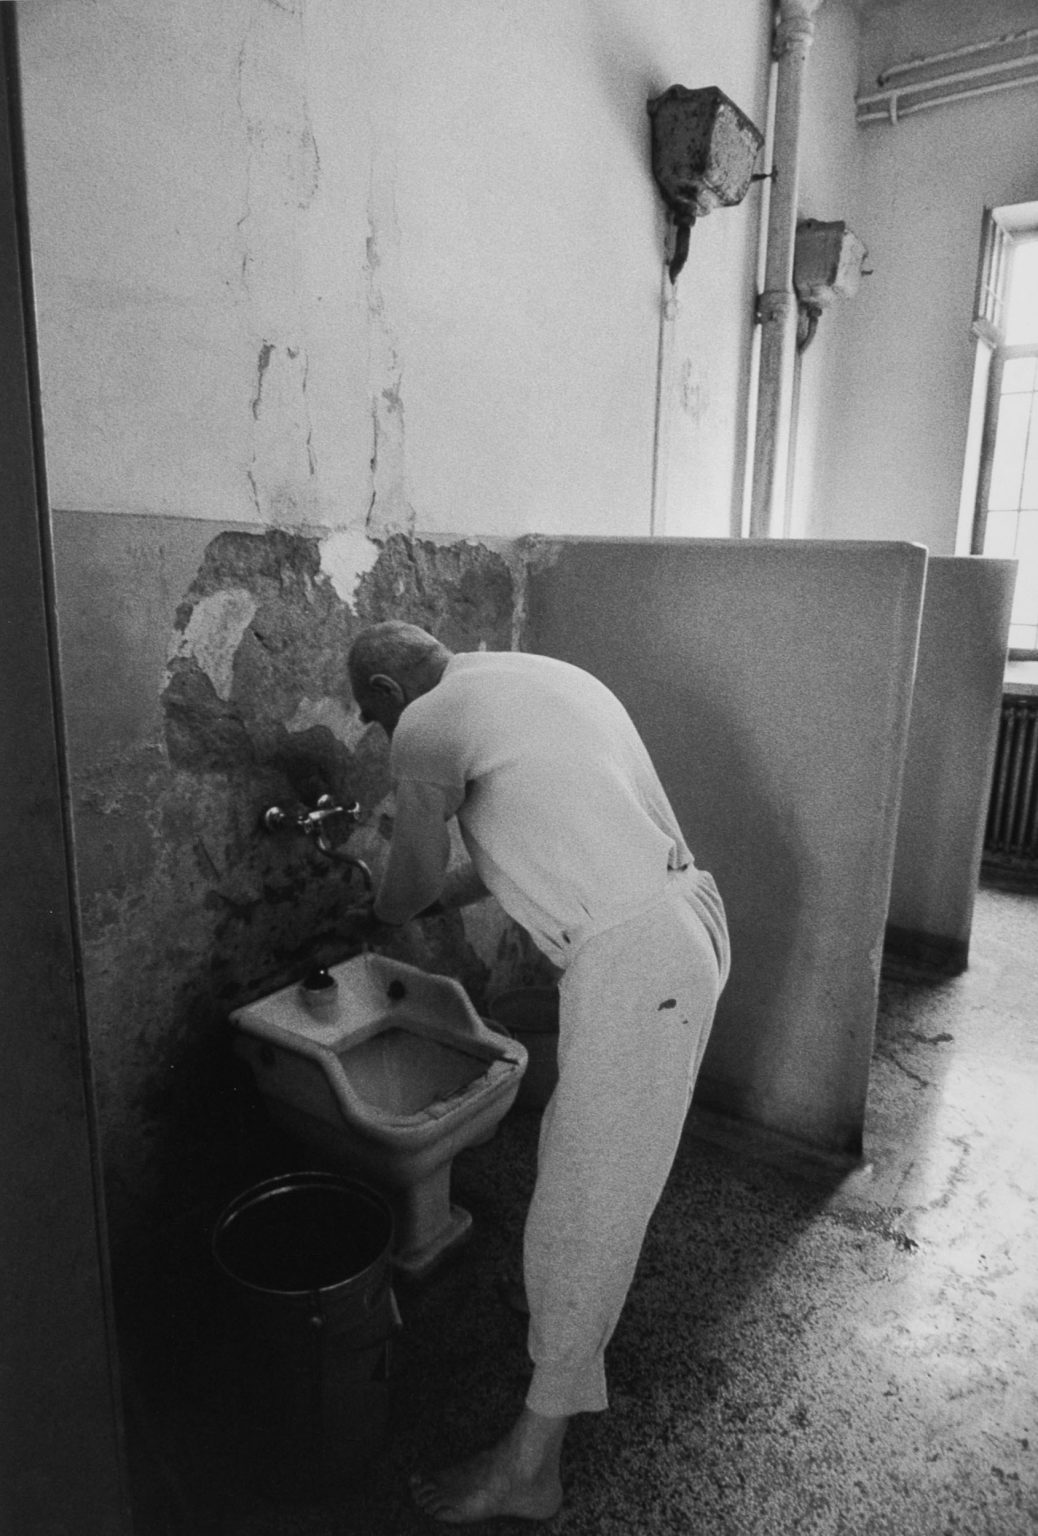 ISTITUTI PSICHIATRICI GORIZIA 1968